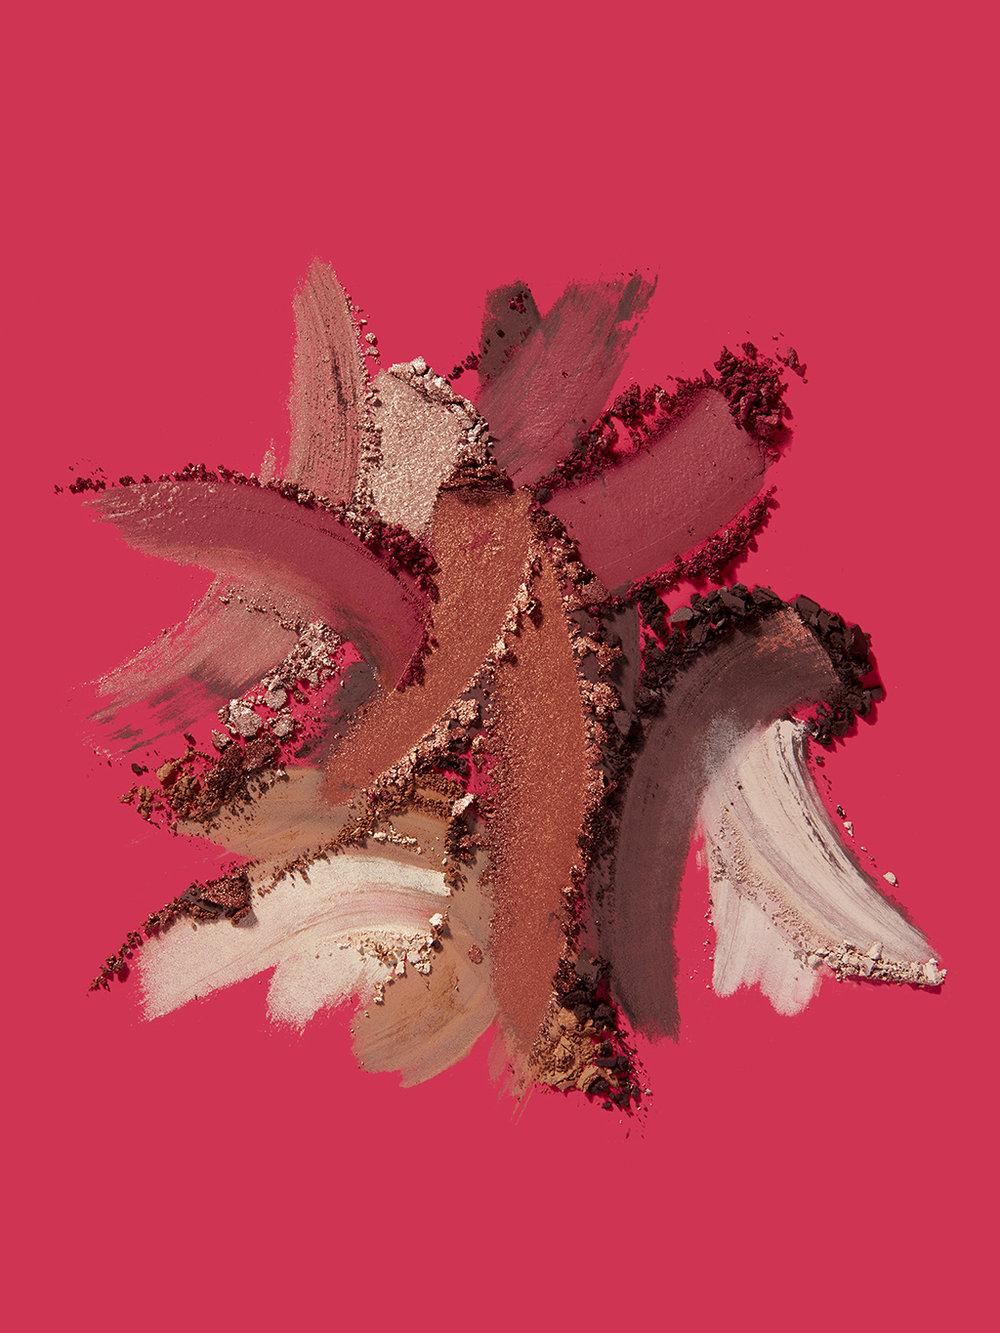 Jon Paterson_Cosmetics_Textures023.jpg